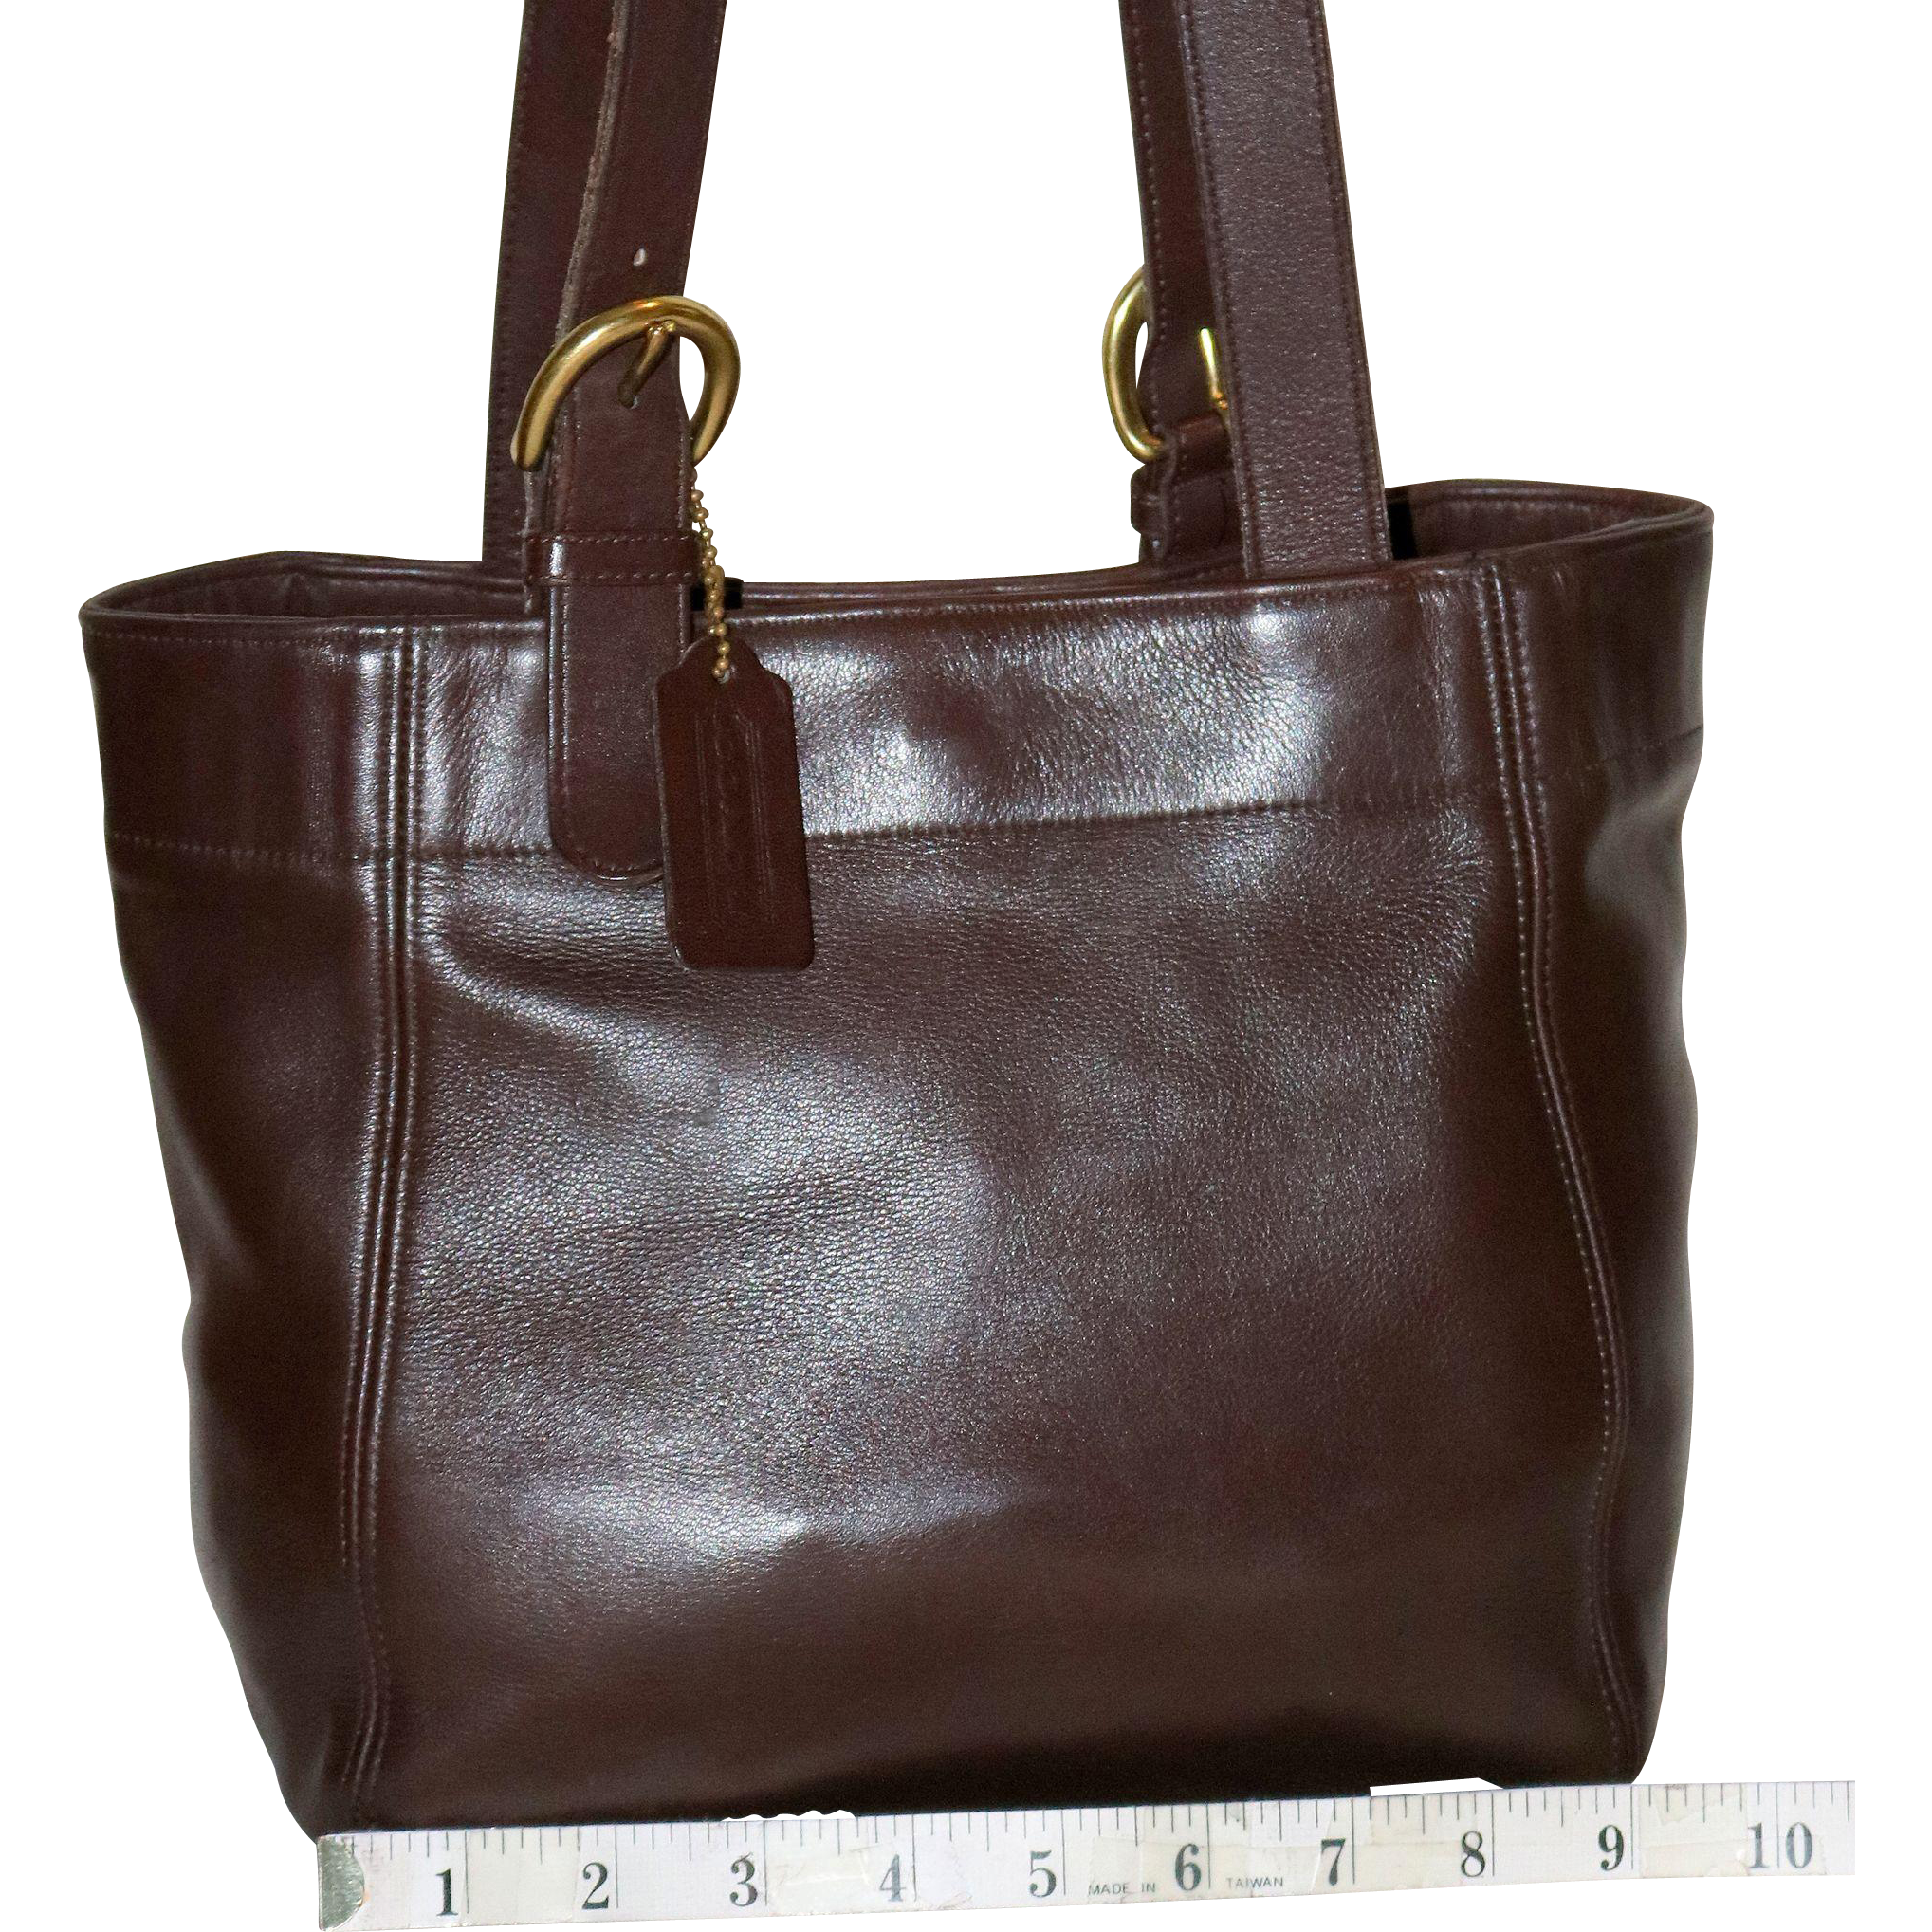 df4e53498cc5f ... discount code for vintage coach buckle bag tote u.s. model nenghetty  ruby lane 40cfa b641f